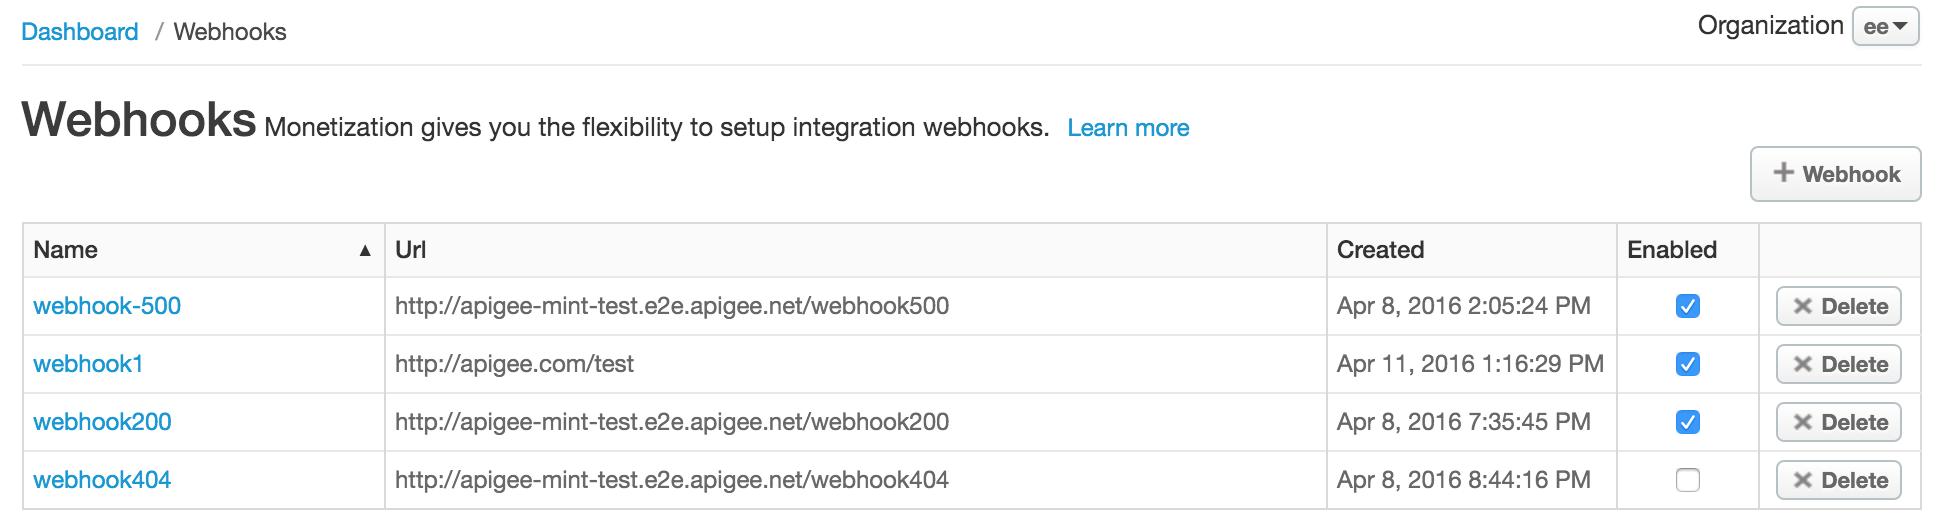 Set up notifications using webhooks | Apigee Docs